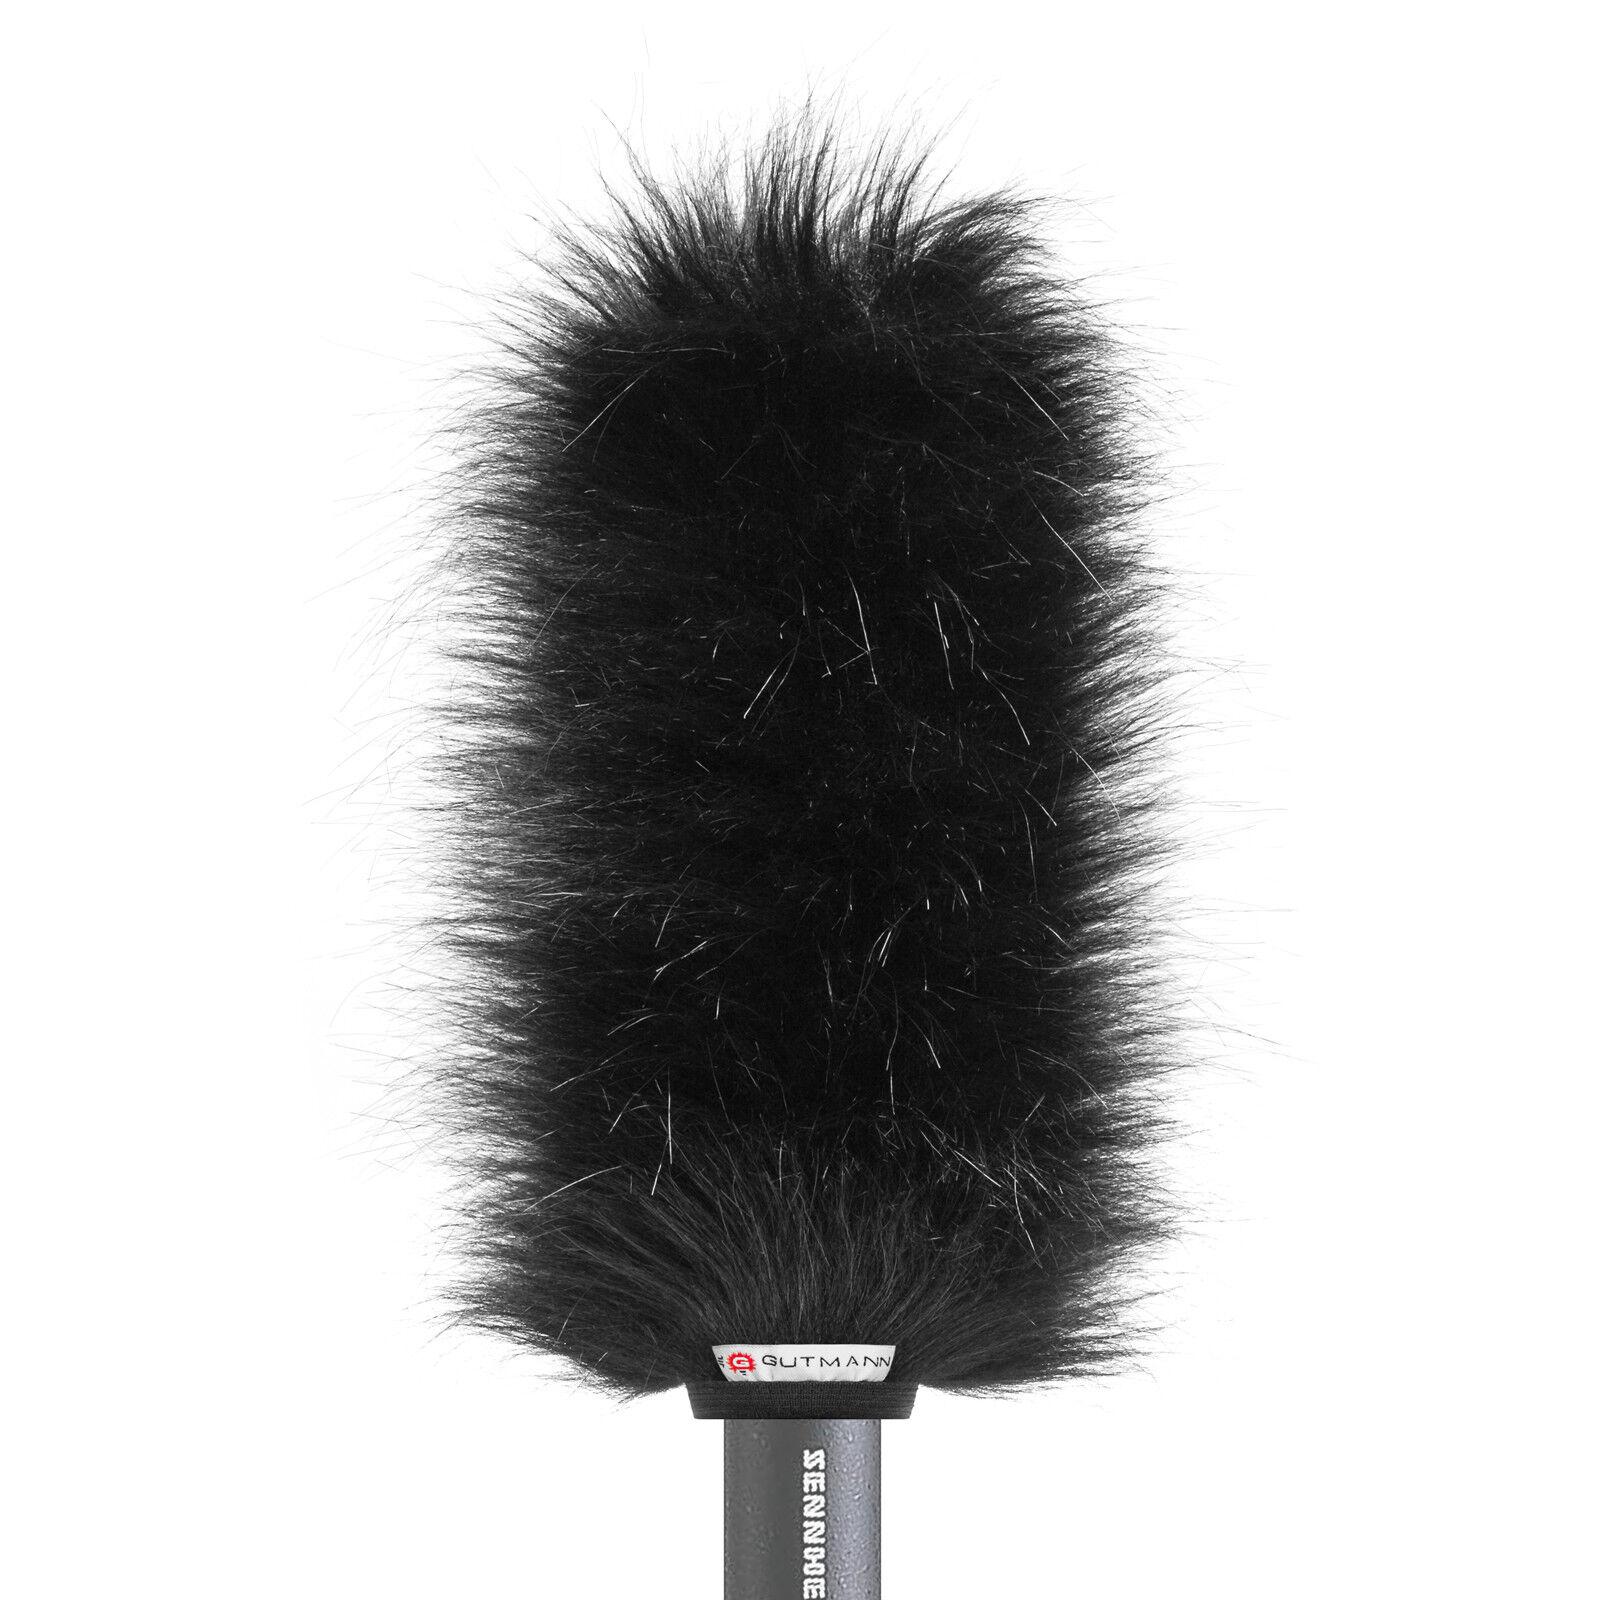 Gutmann Microphone Fur Windscreen Windshield for Canon XL1 / XL1S / XL2